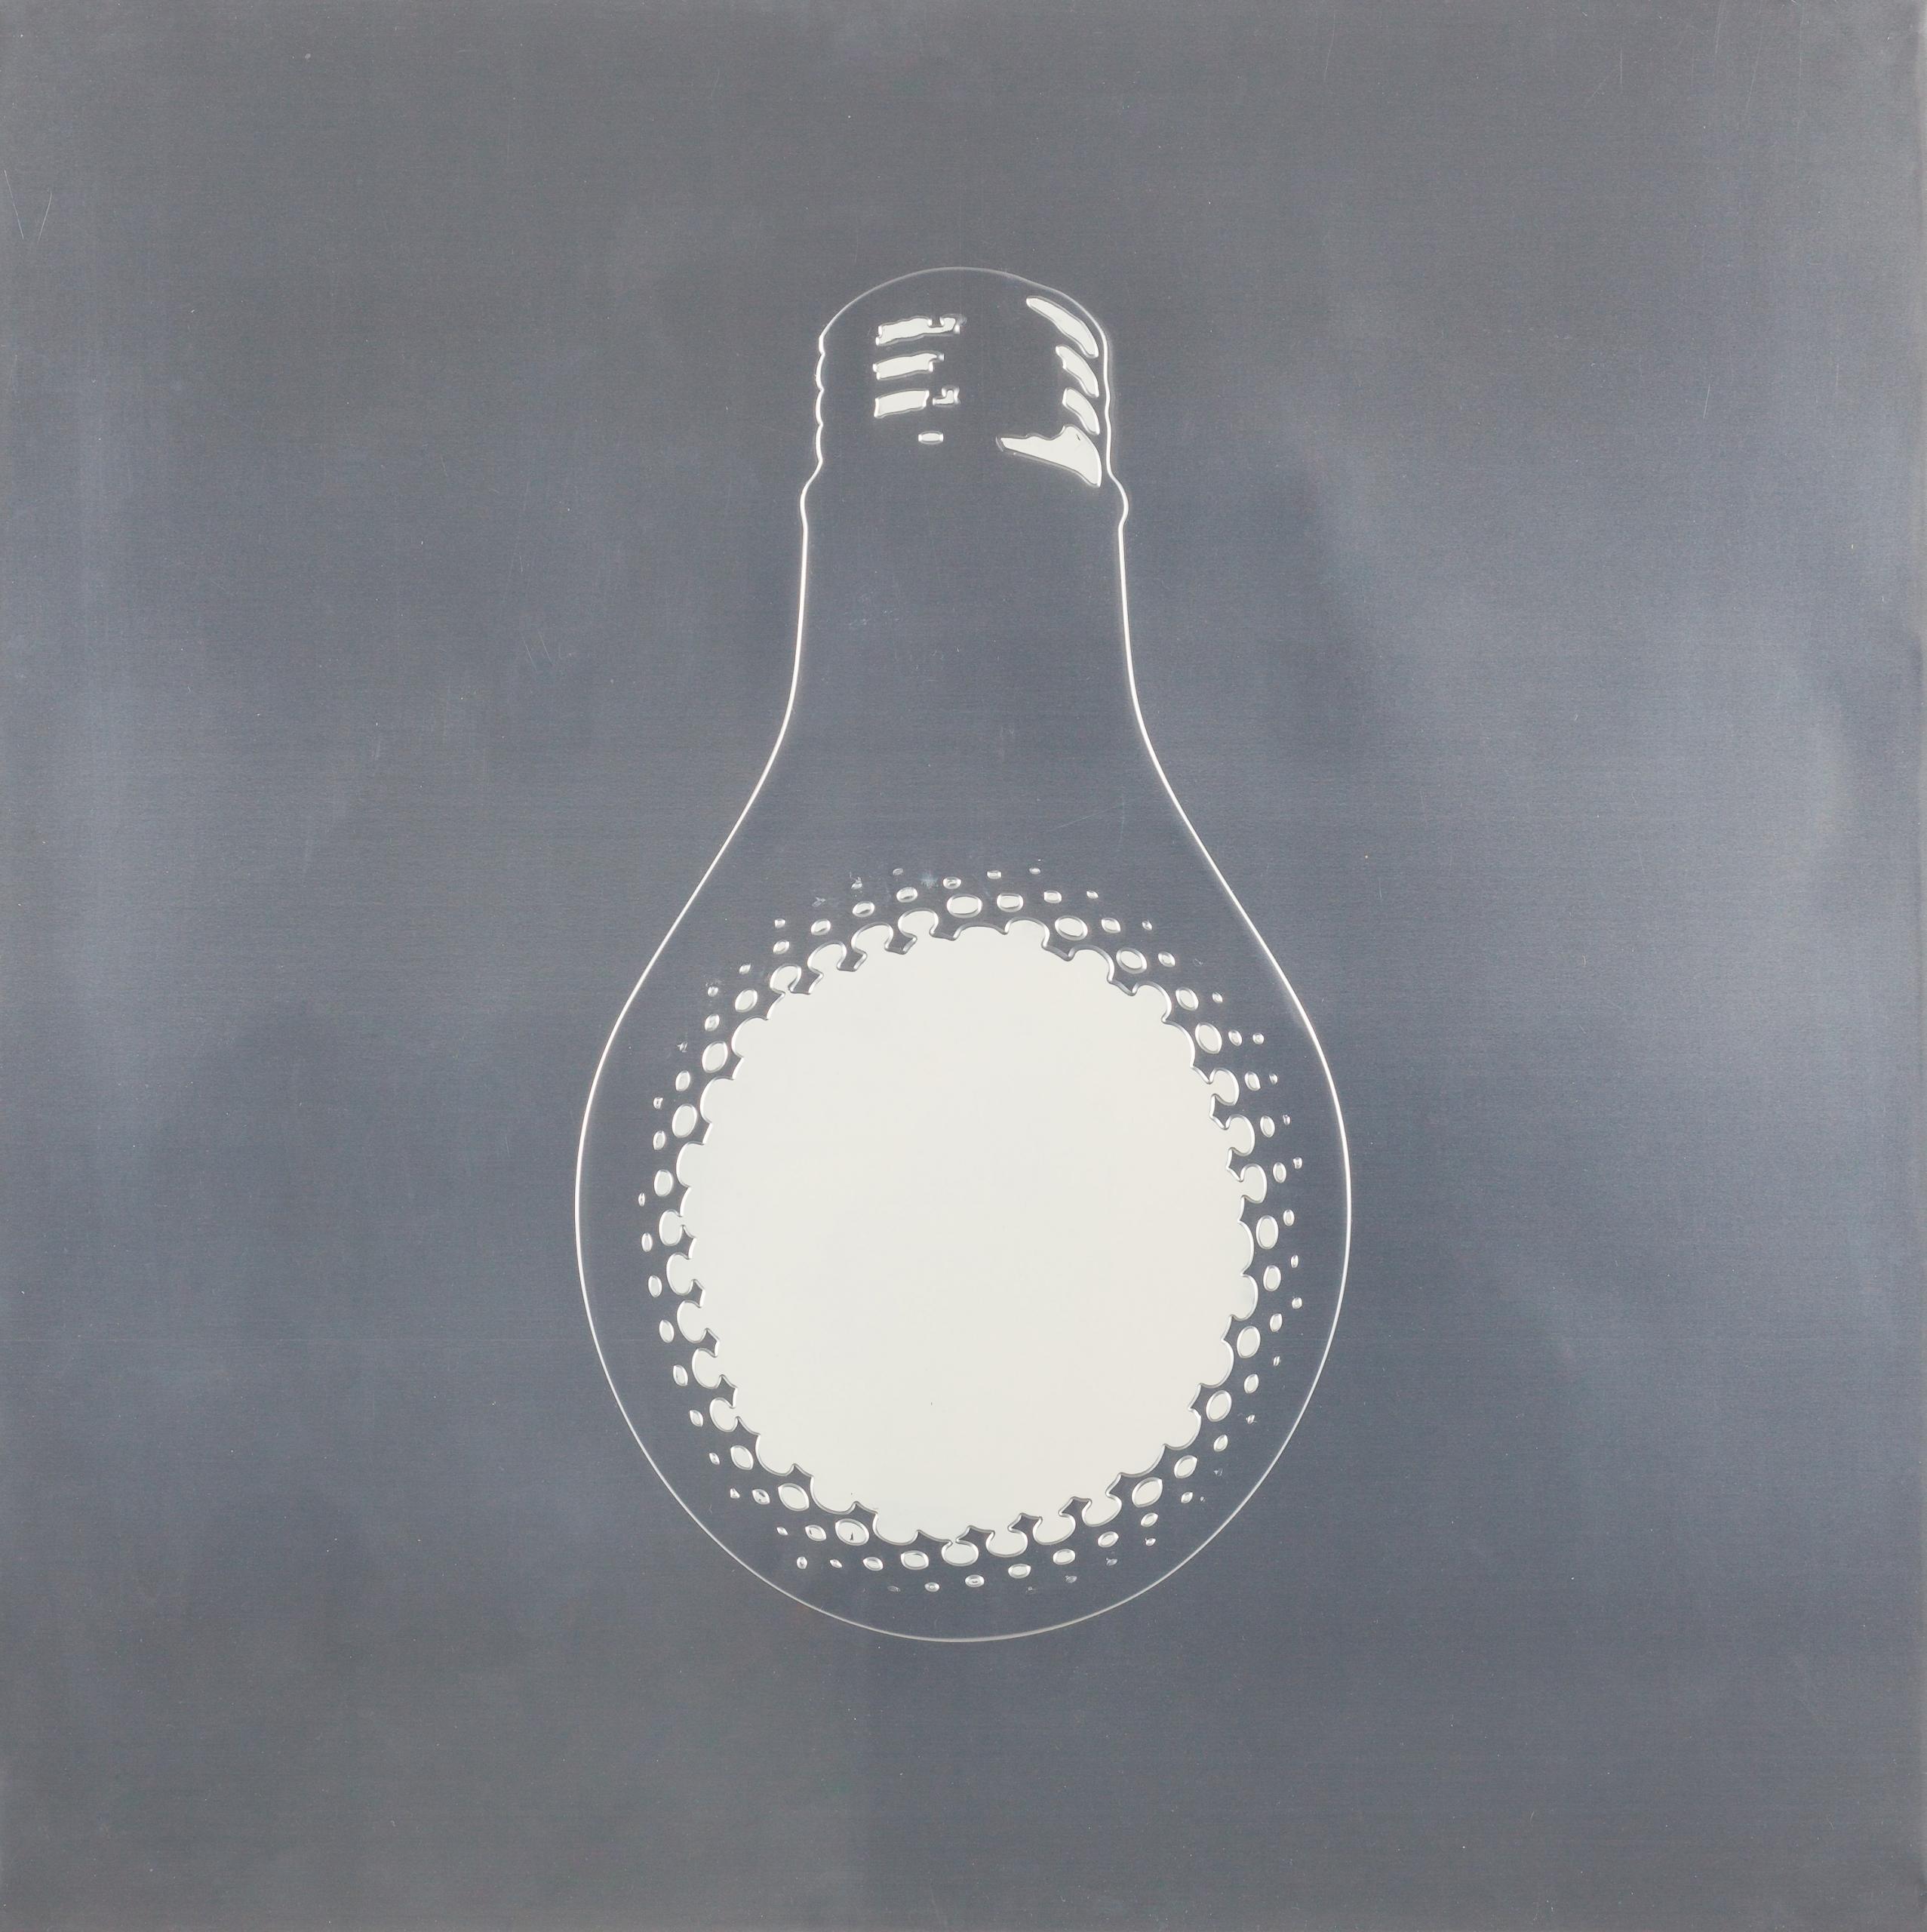 Peter Kogler, Glühbirne